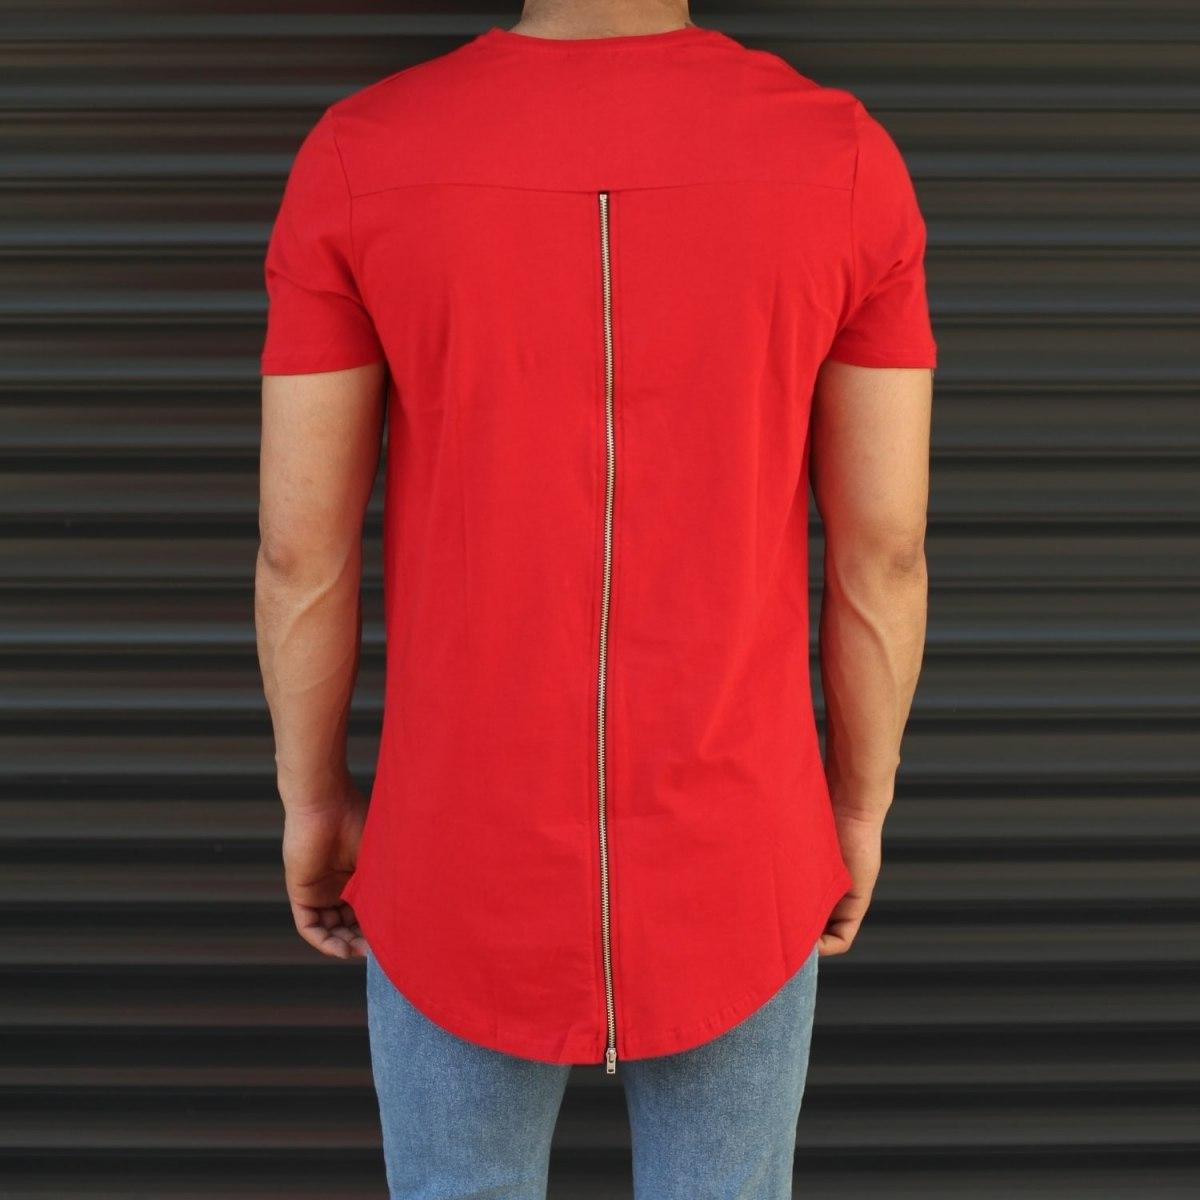 Men's Longline Back-Zipper T-Shirt In Red Mv Premium Brand - 2